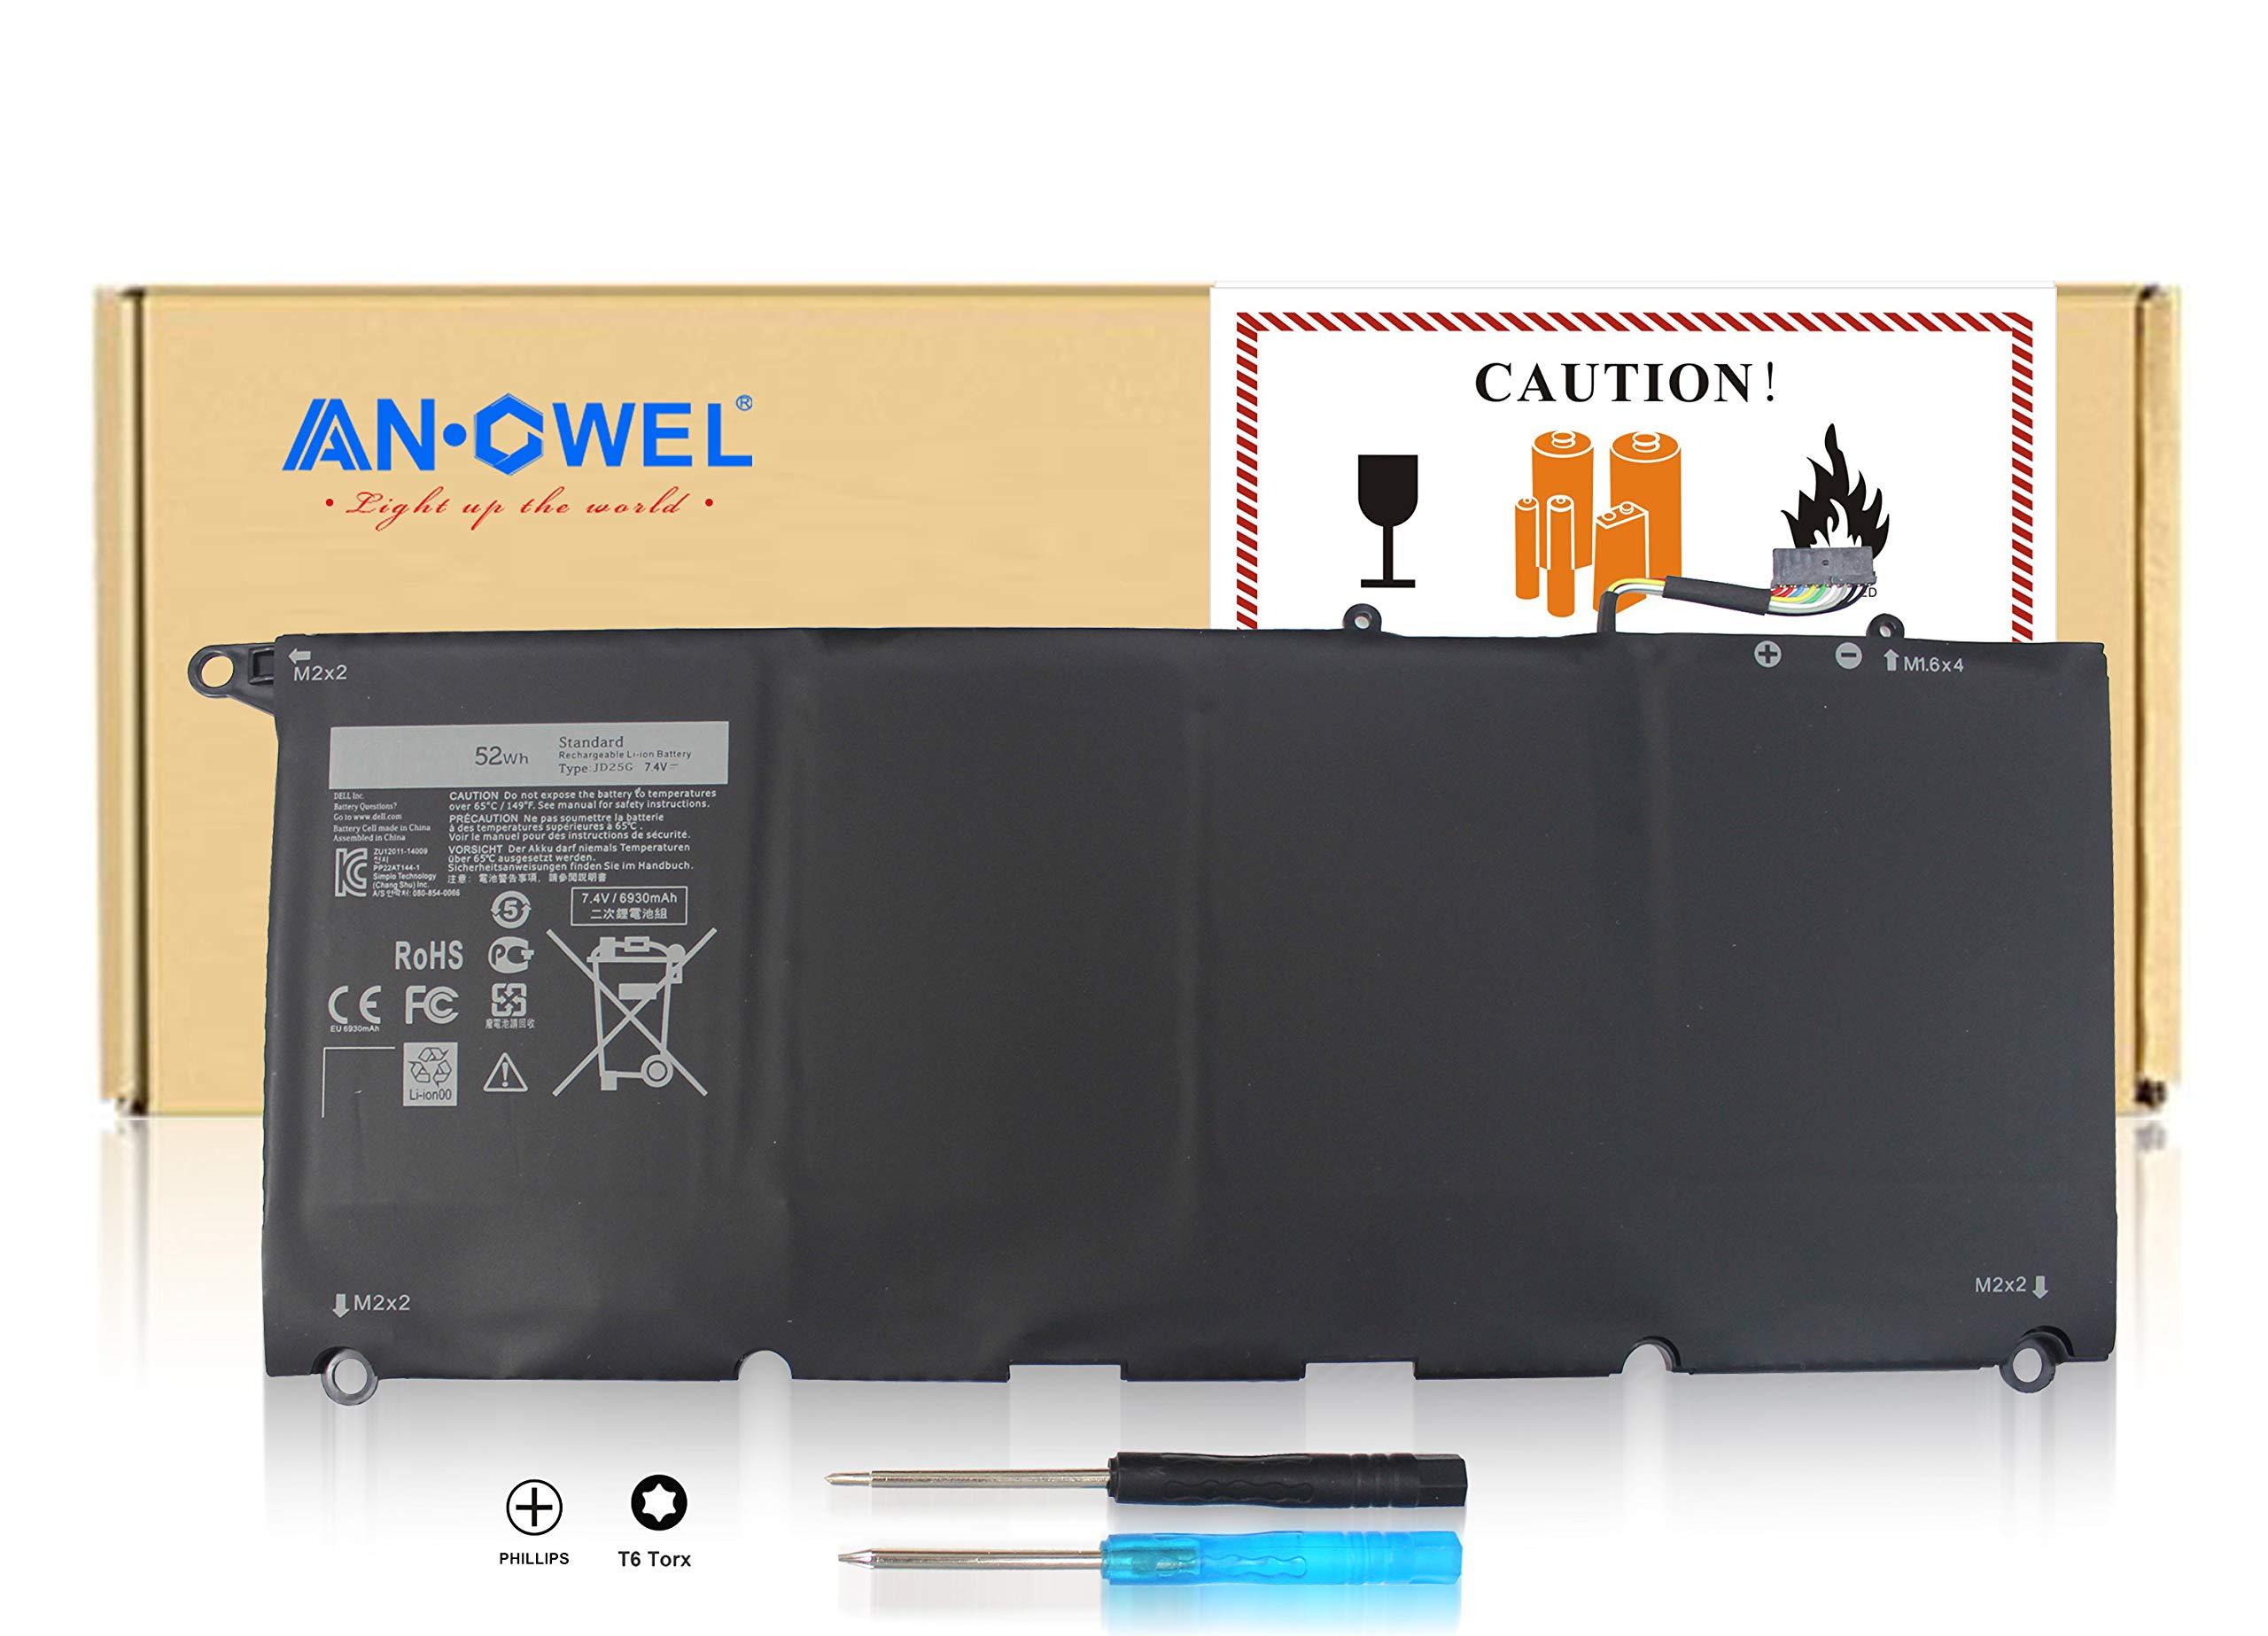 Bateria Jd25g Para Dell Xps 13 Xps 13d 9343 Xps13 9350 Series Para 5k9cp Din02 Rwt1r 90v7w 7.4v 52wh -